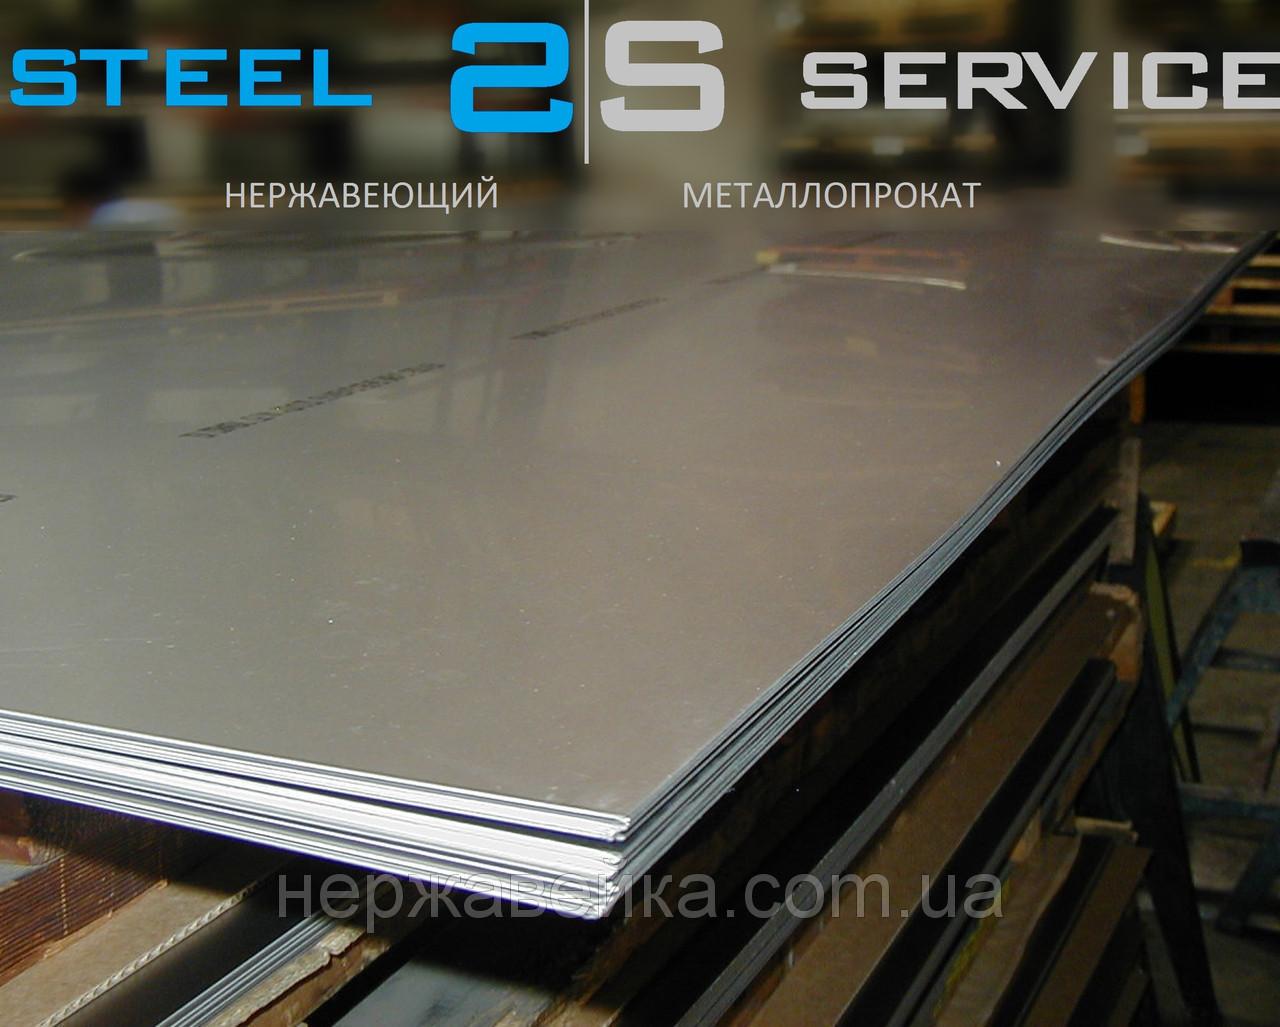 Нержавеющий лист 1,5х1250х2500мм AISI 430(12Х17) 4N - шлифованный, технический